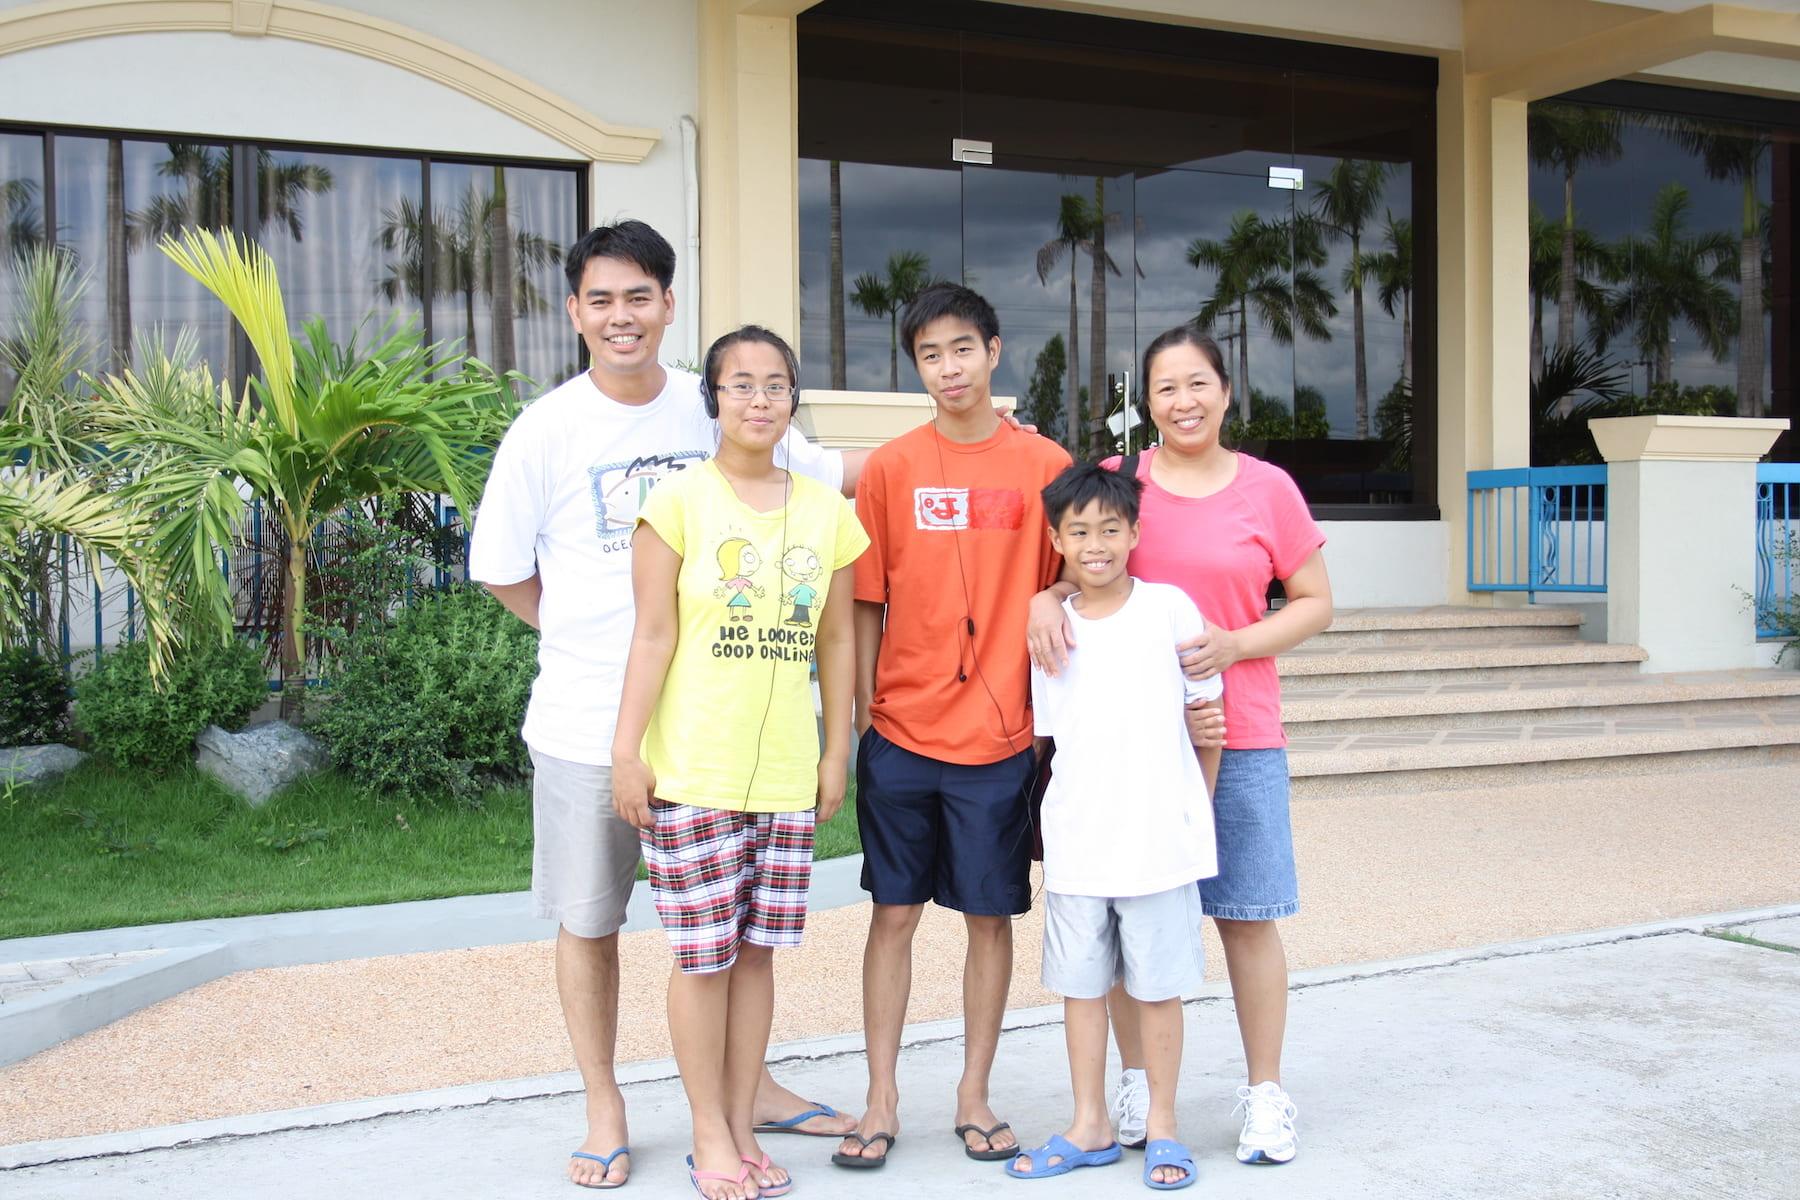 Emmanuel Domingo and family